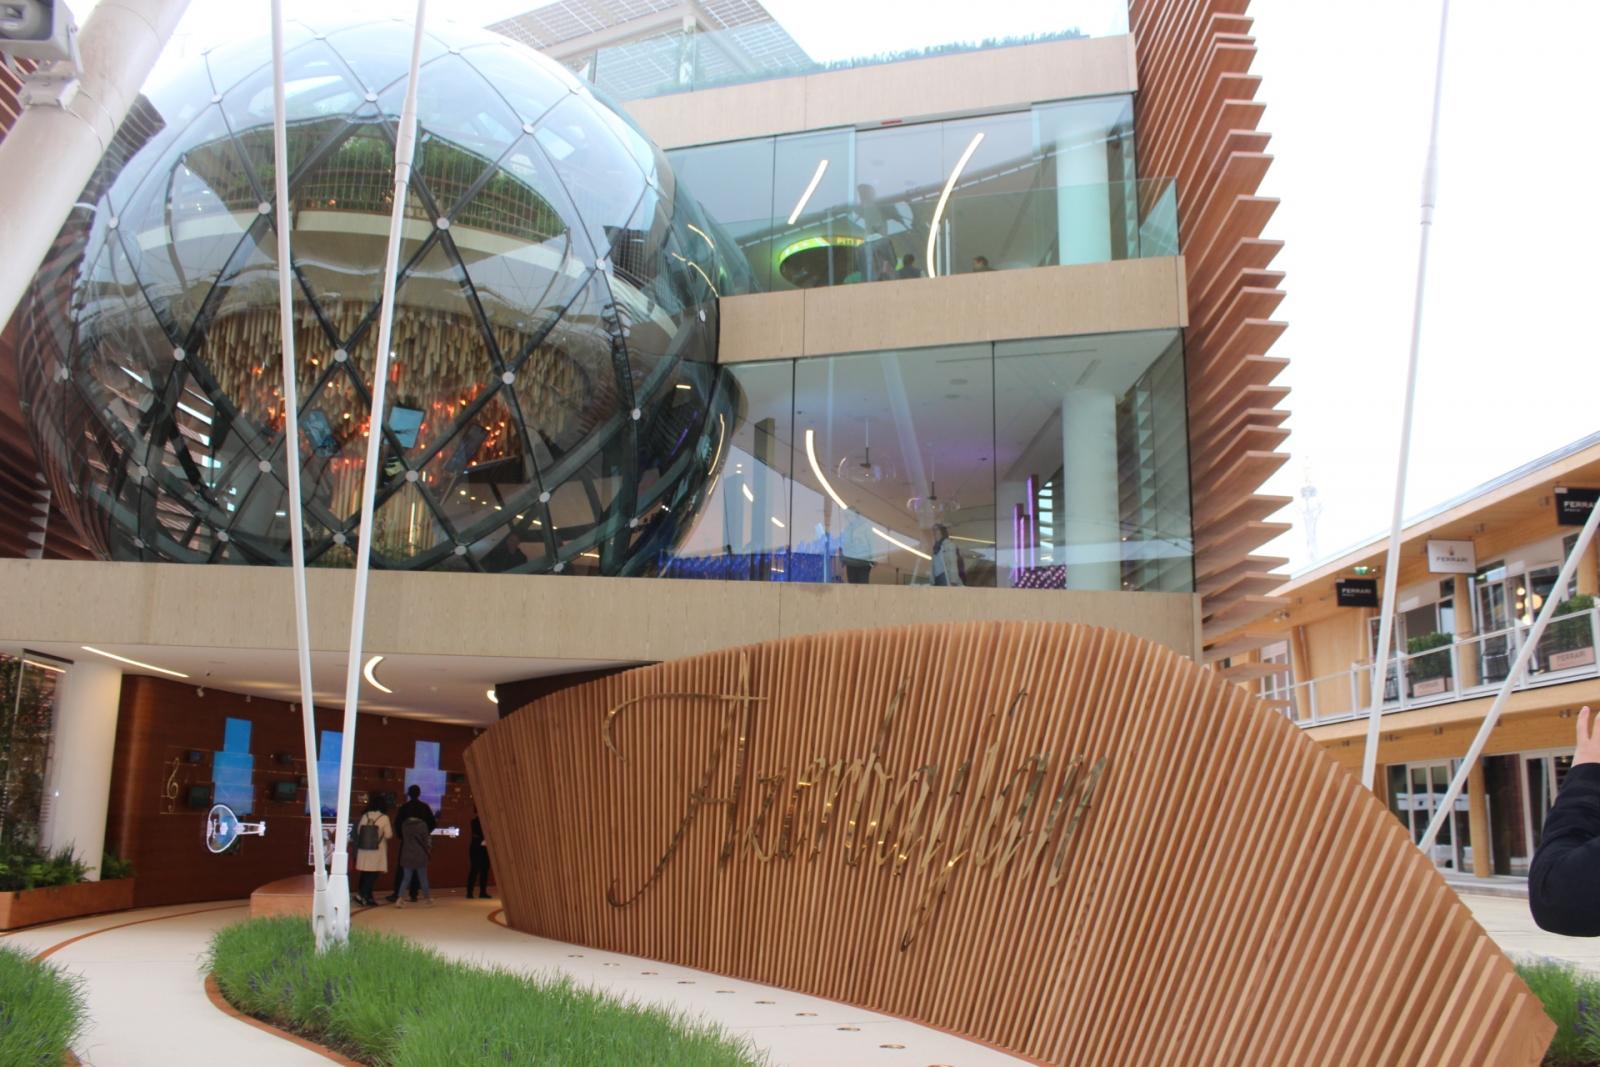 Expo Milano 2015 pavilions